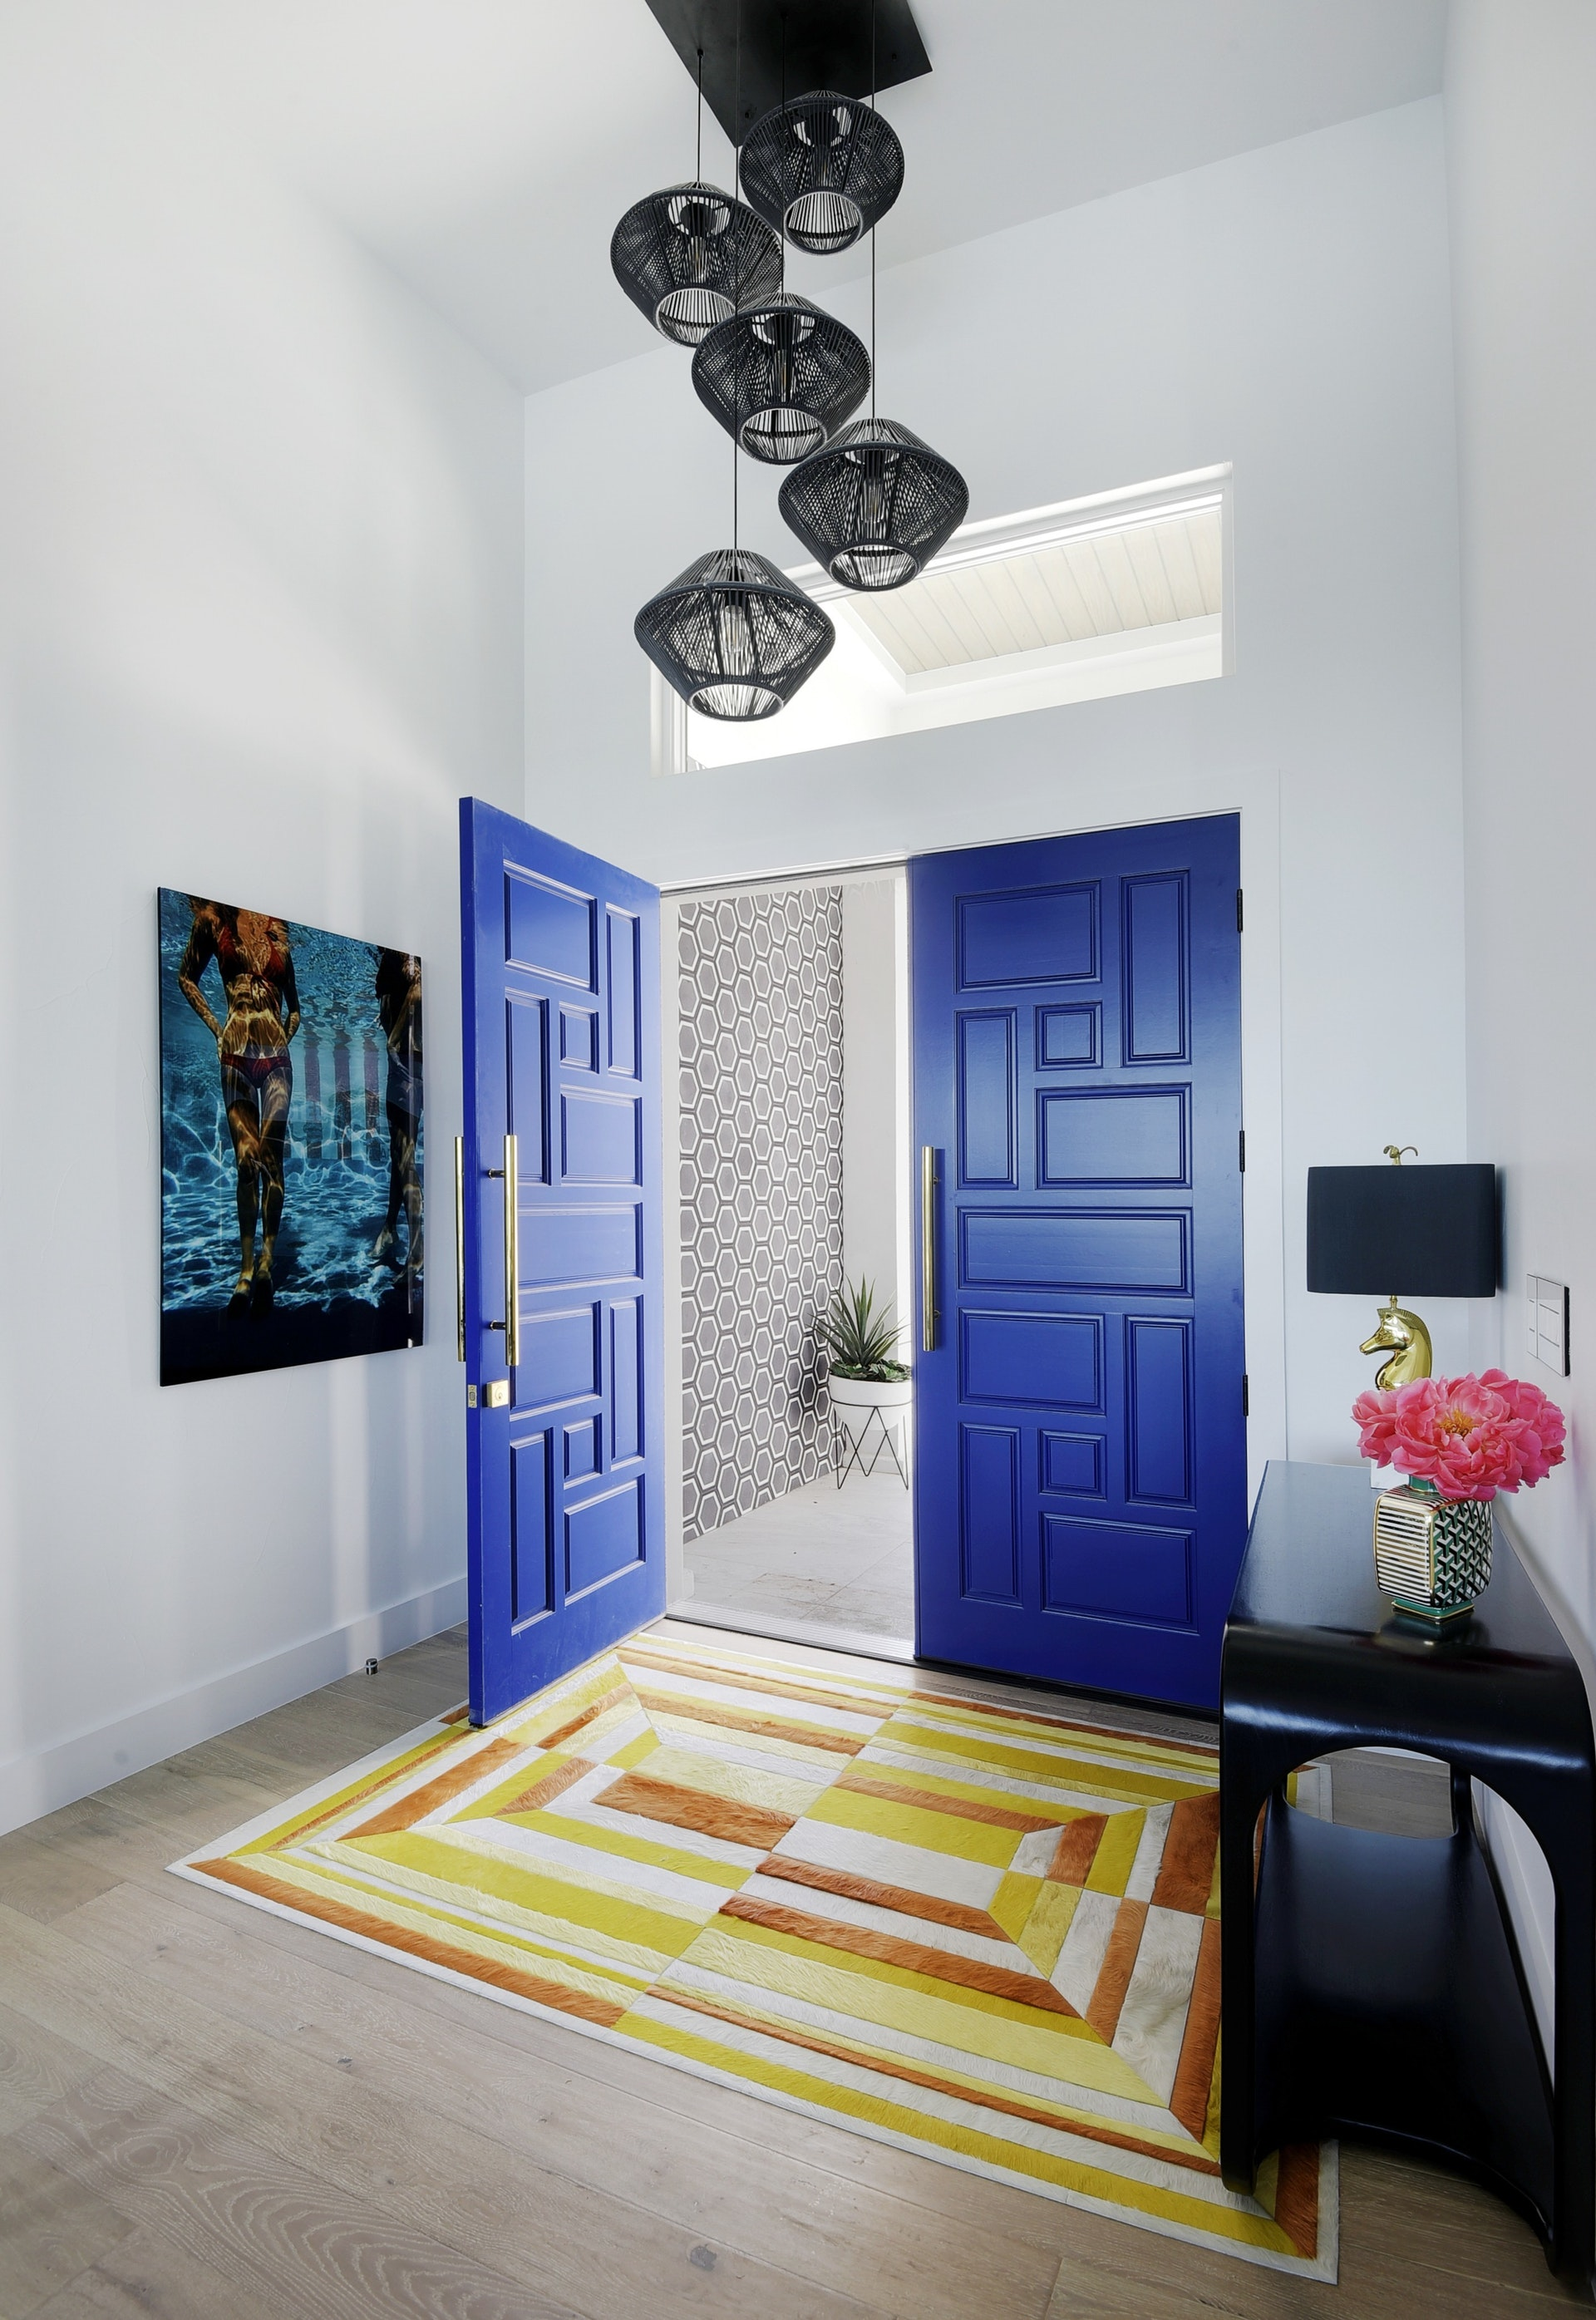 035-293999-Chelsea Kloss Interiors 036_7145553 - Copy.jpg